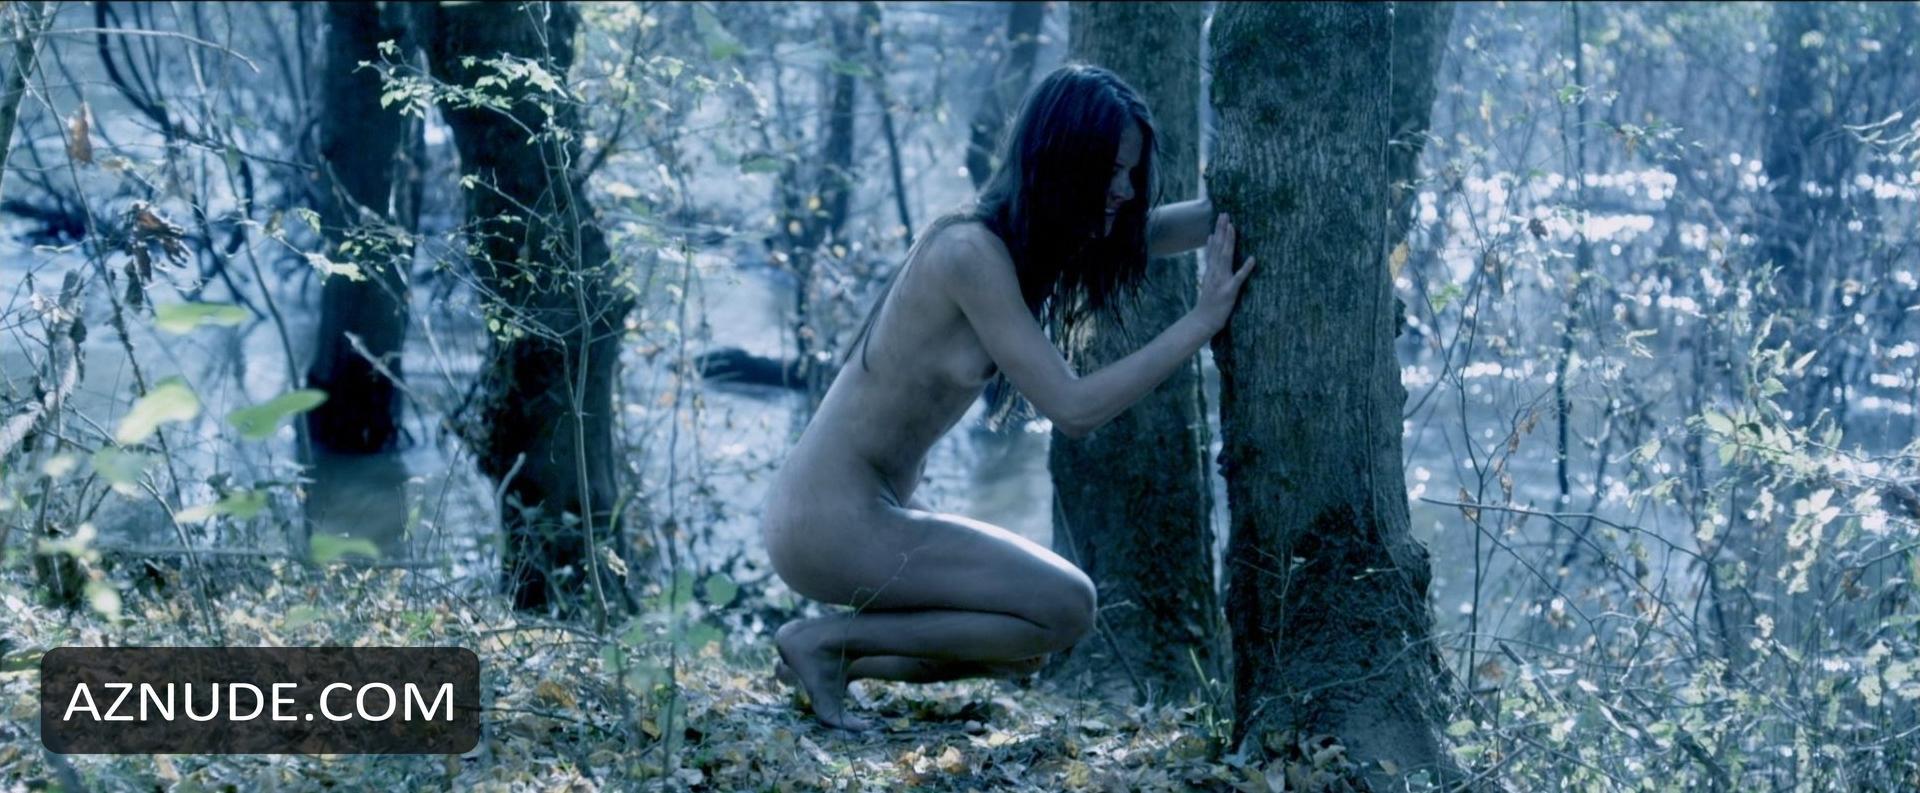 Xxx nude black woman